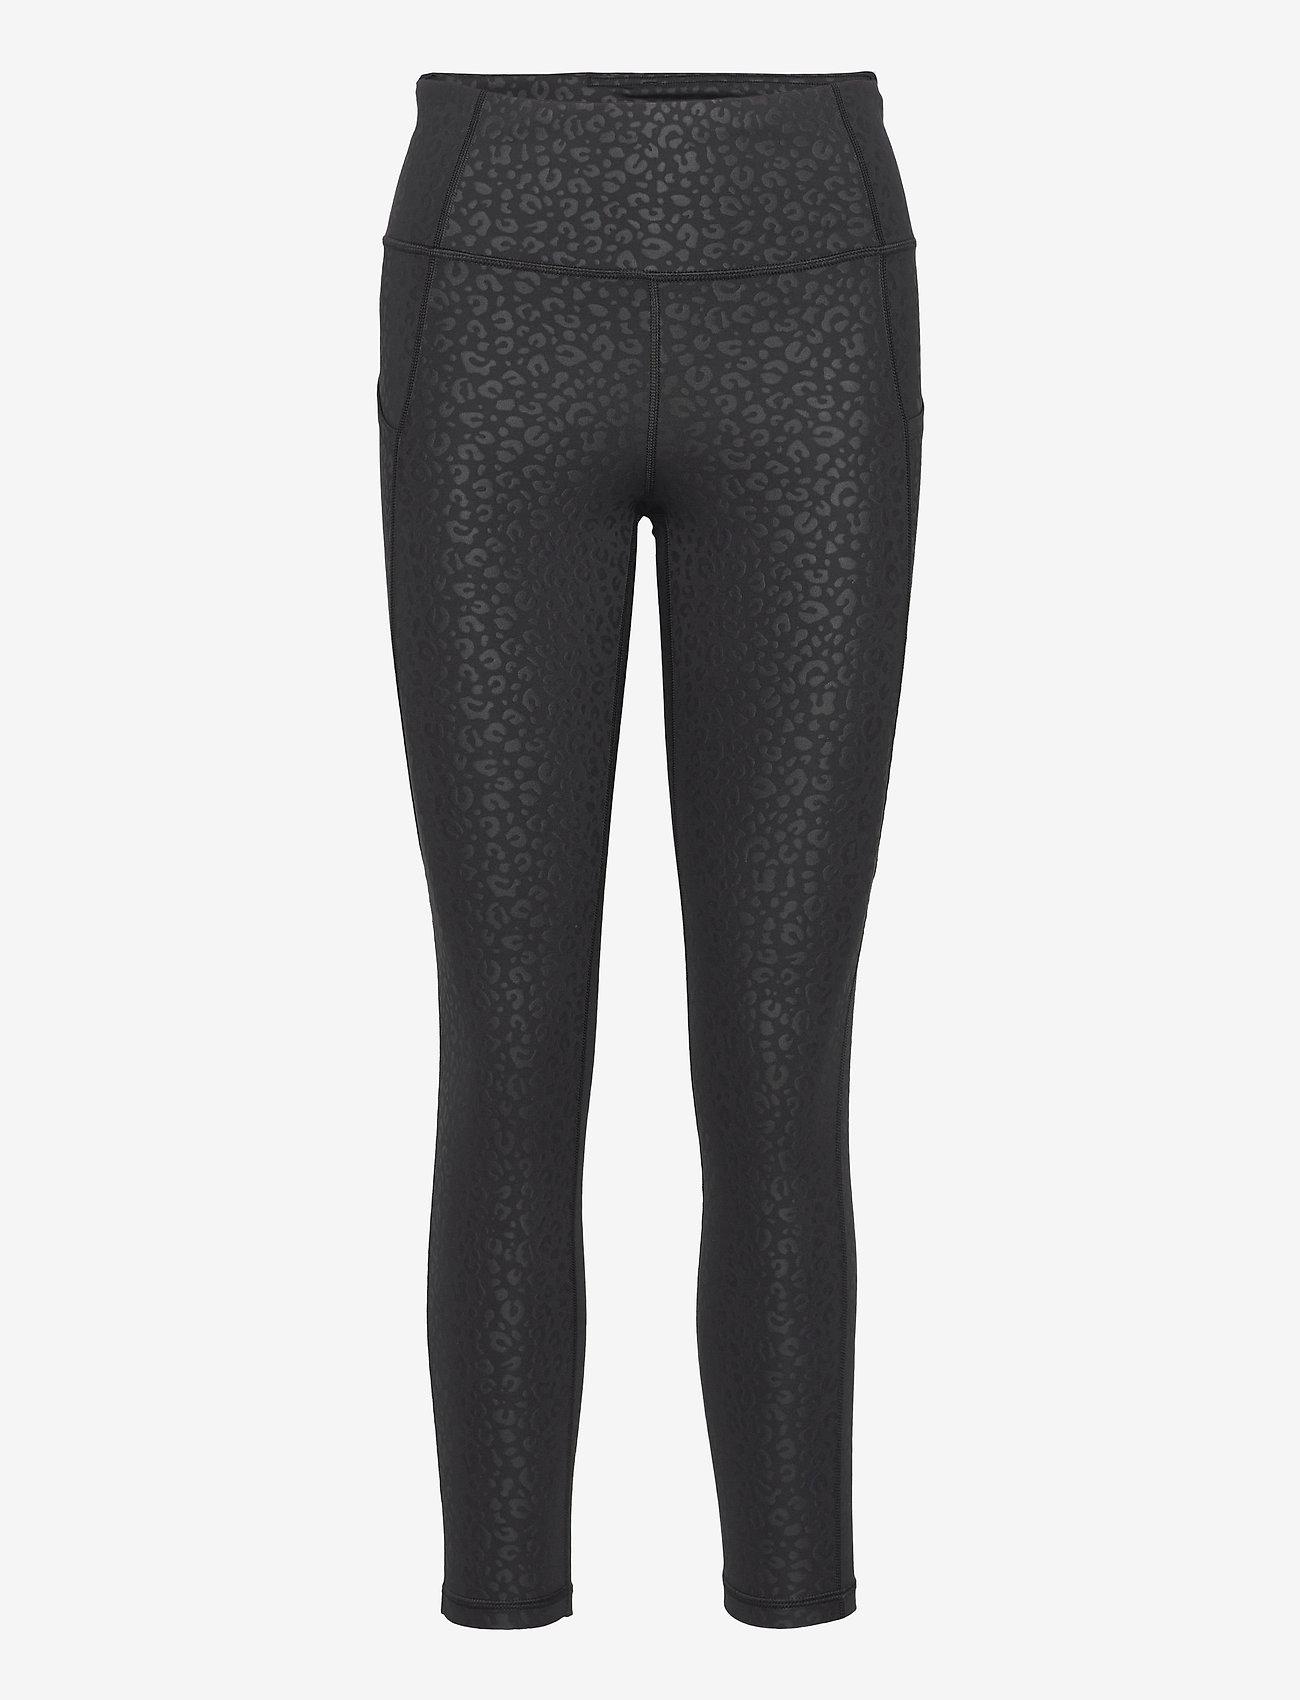 GAP - GapFit High Rise Blackout Full Length Leggings - running & training tights - leopard matte shine - 0